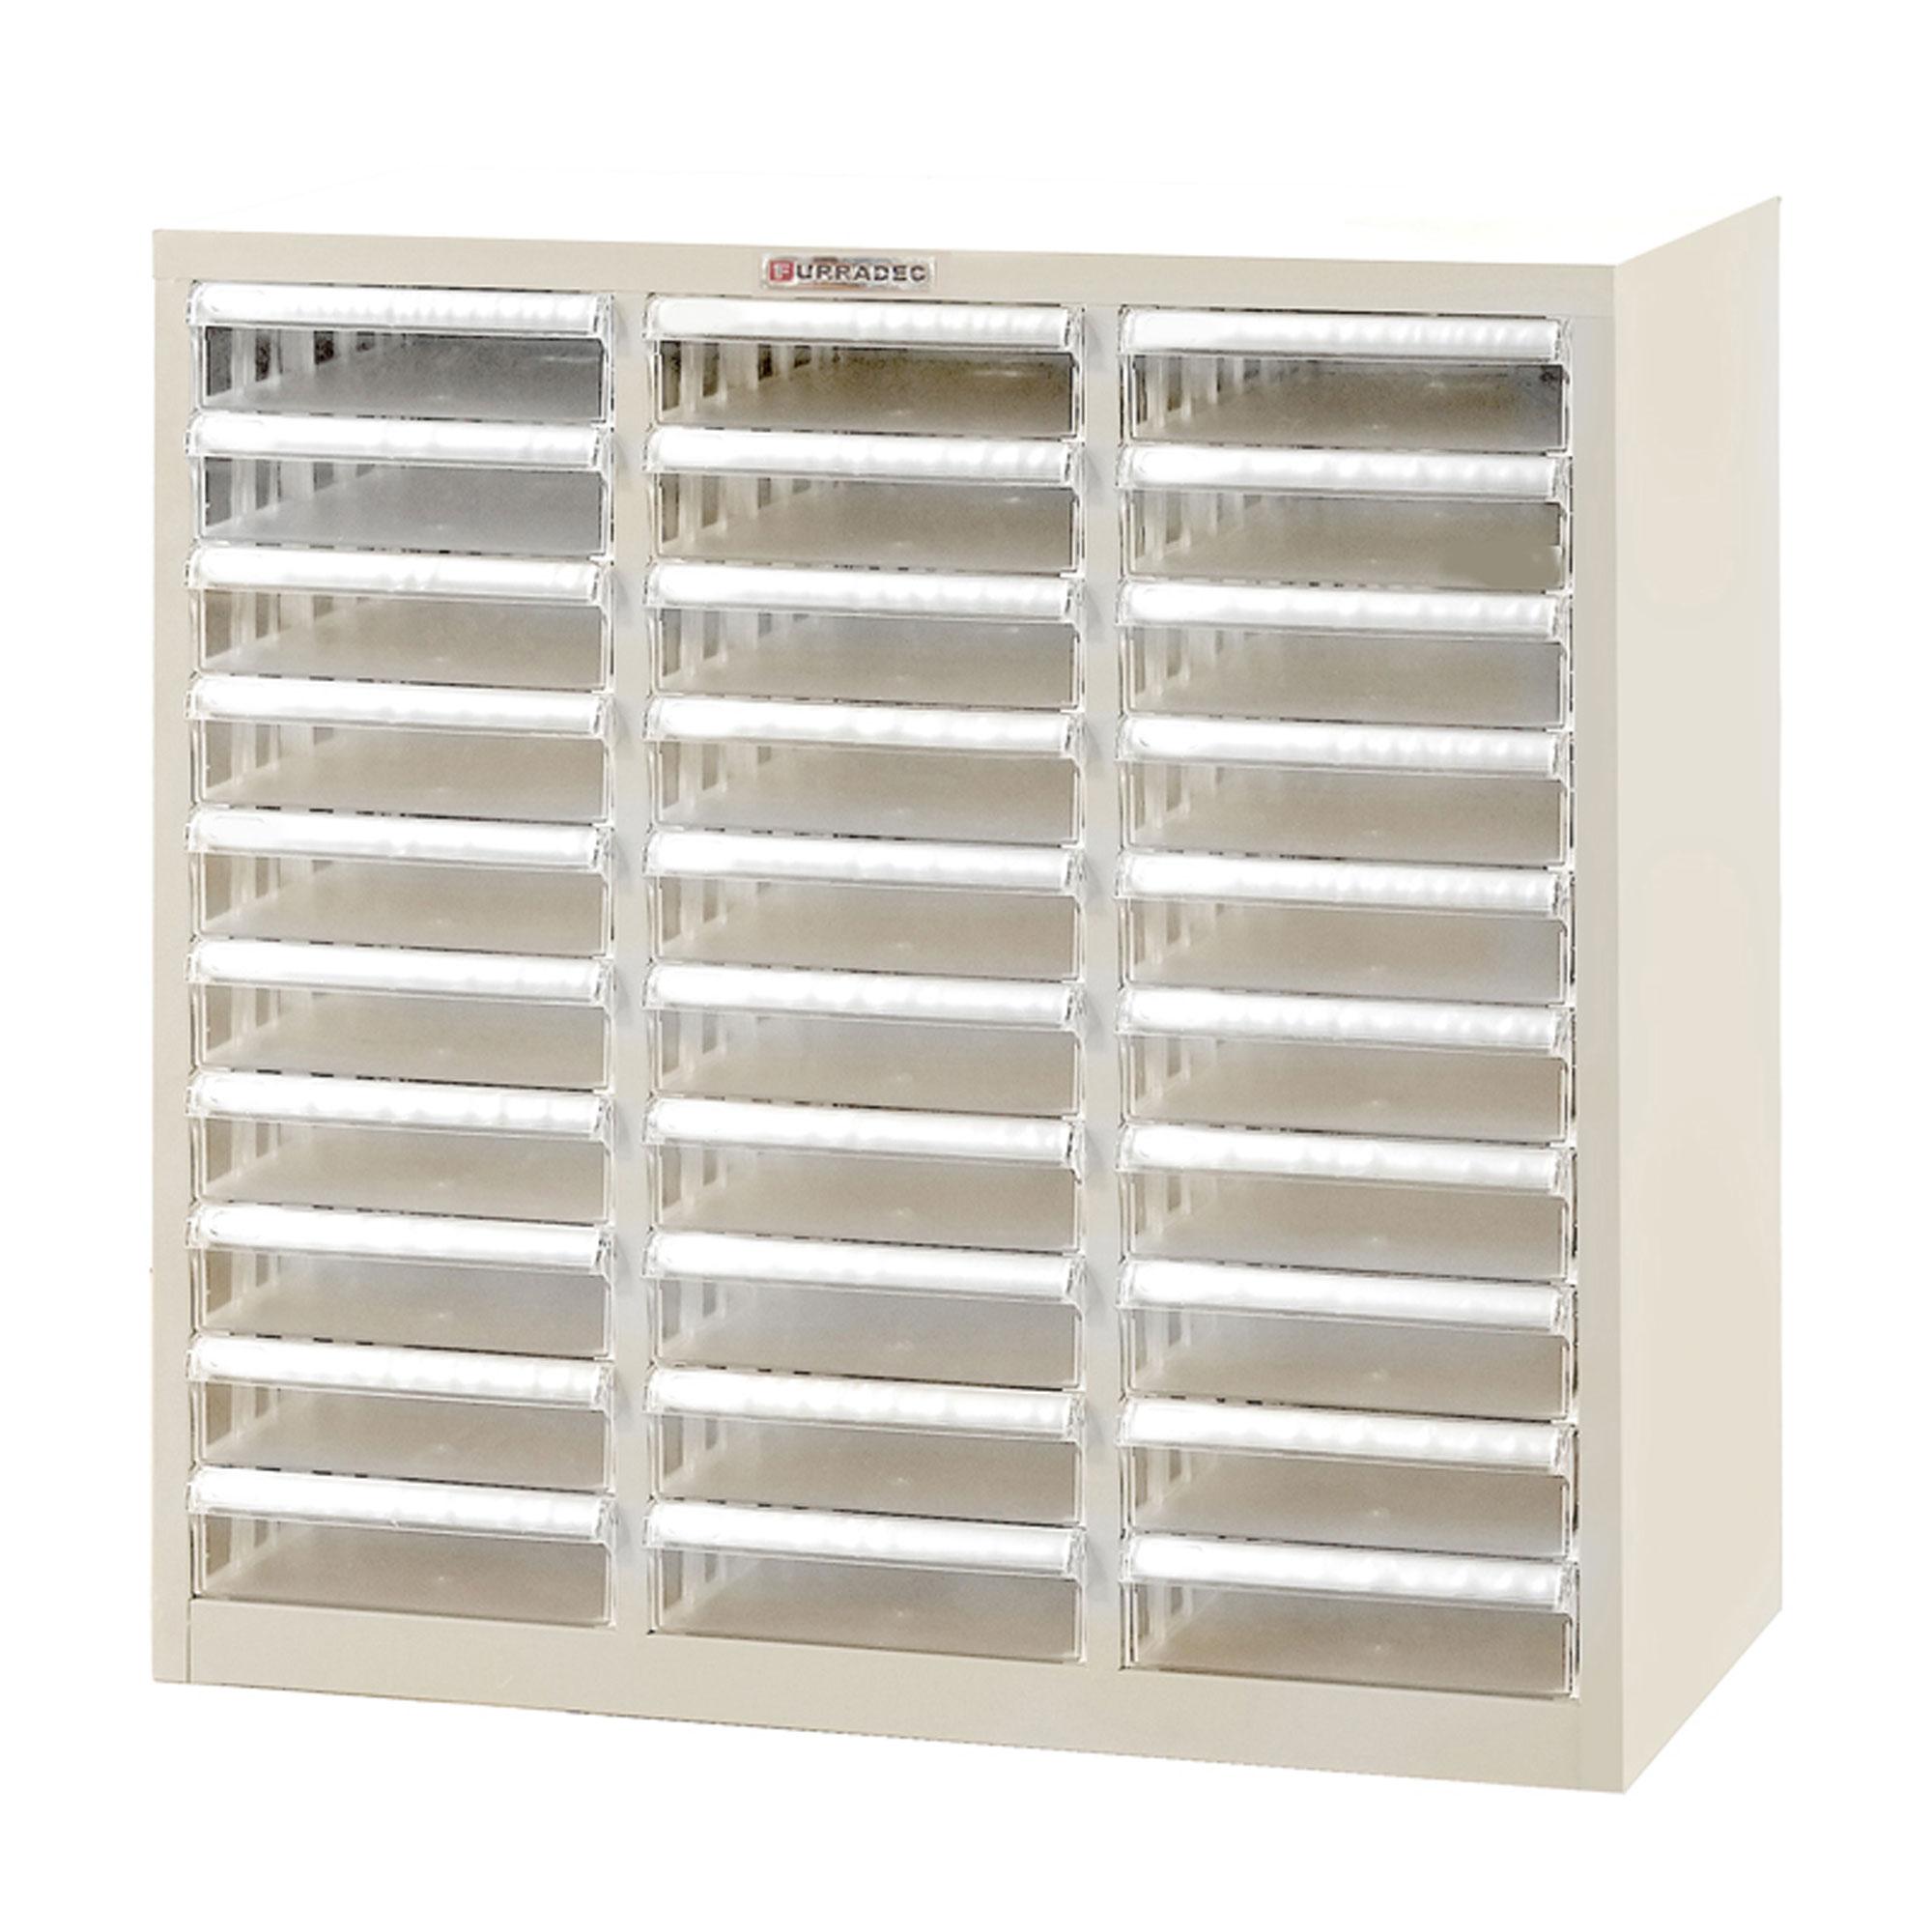 Furradec OD 302 Steel File Cabinet 30 Drawer Cream Document Storage